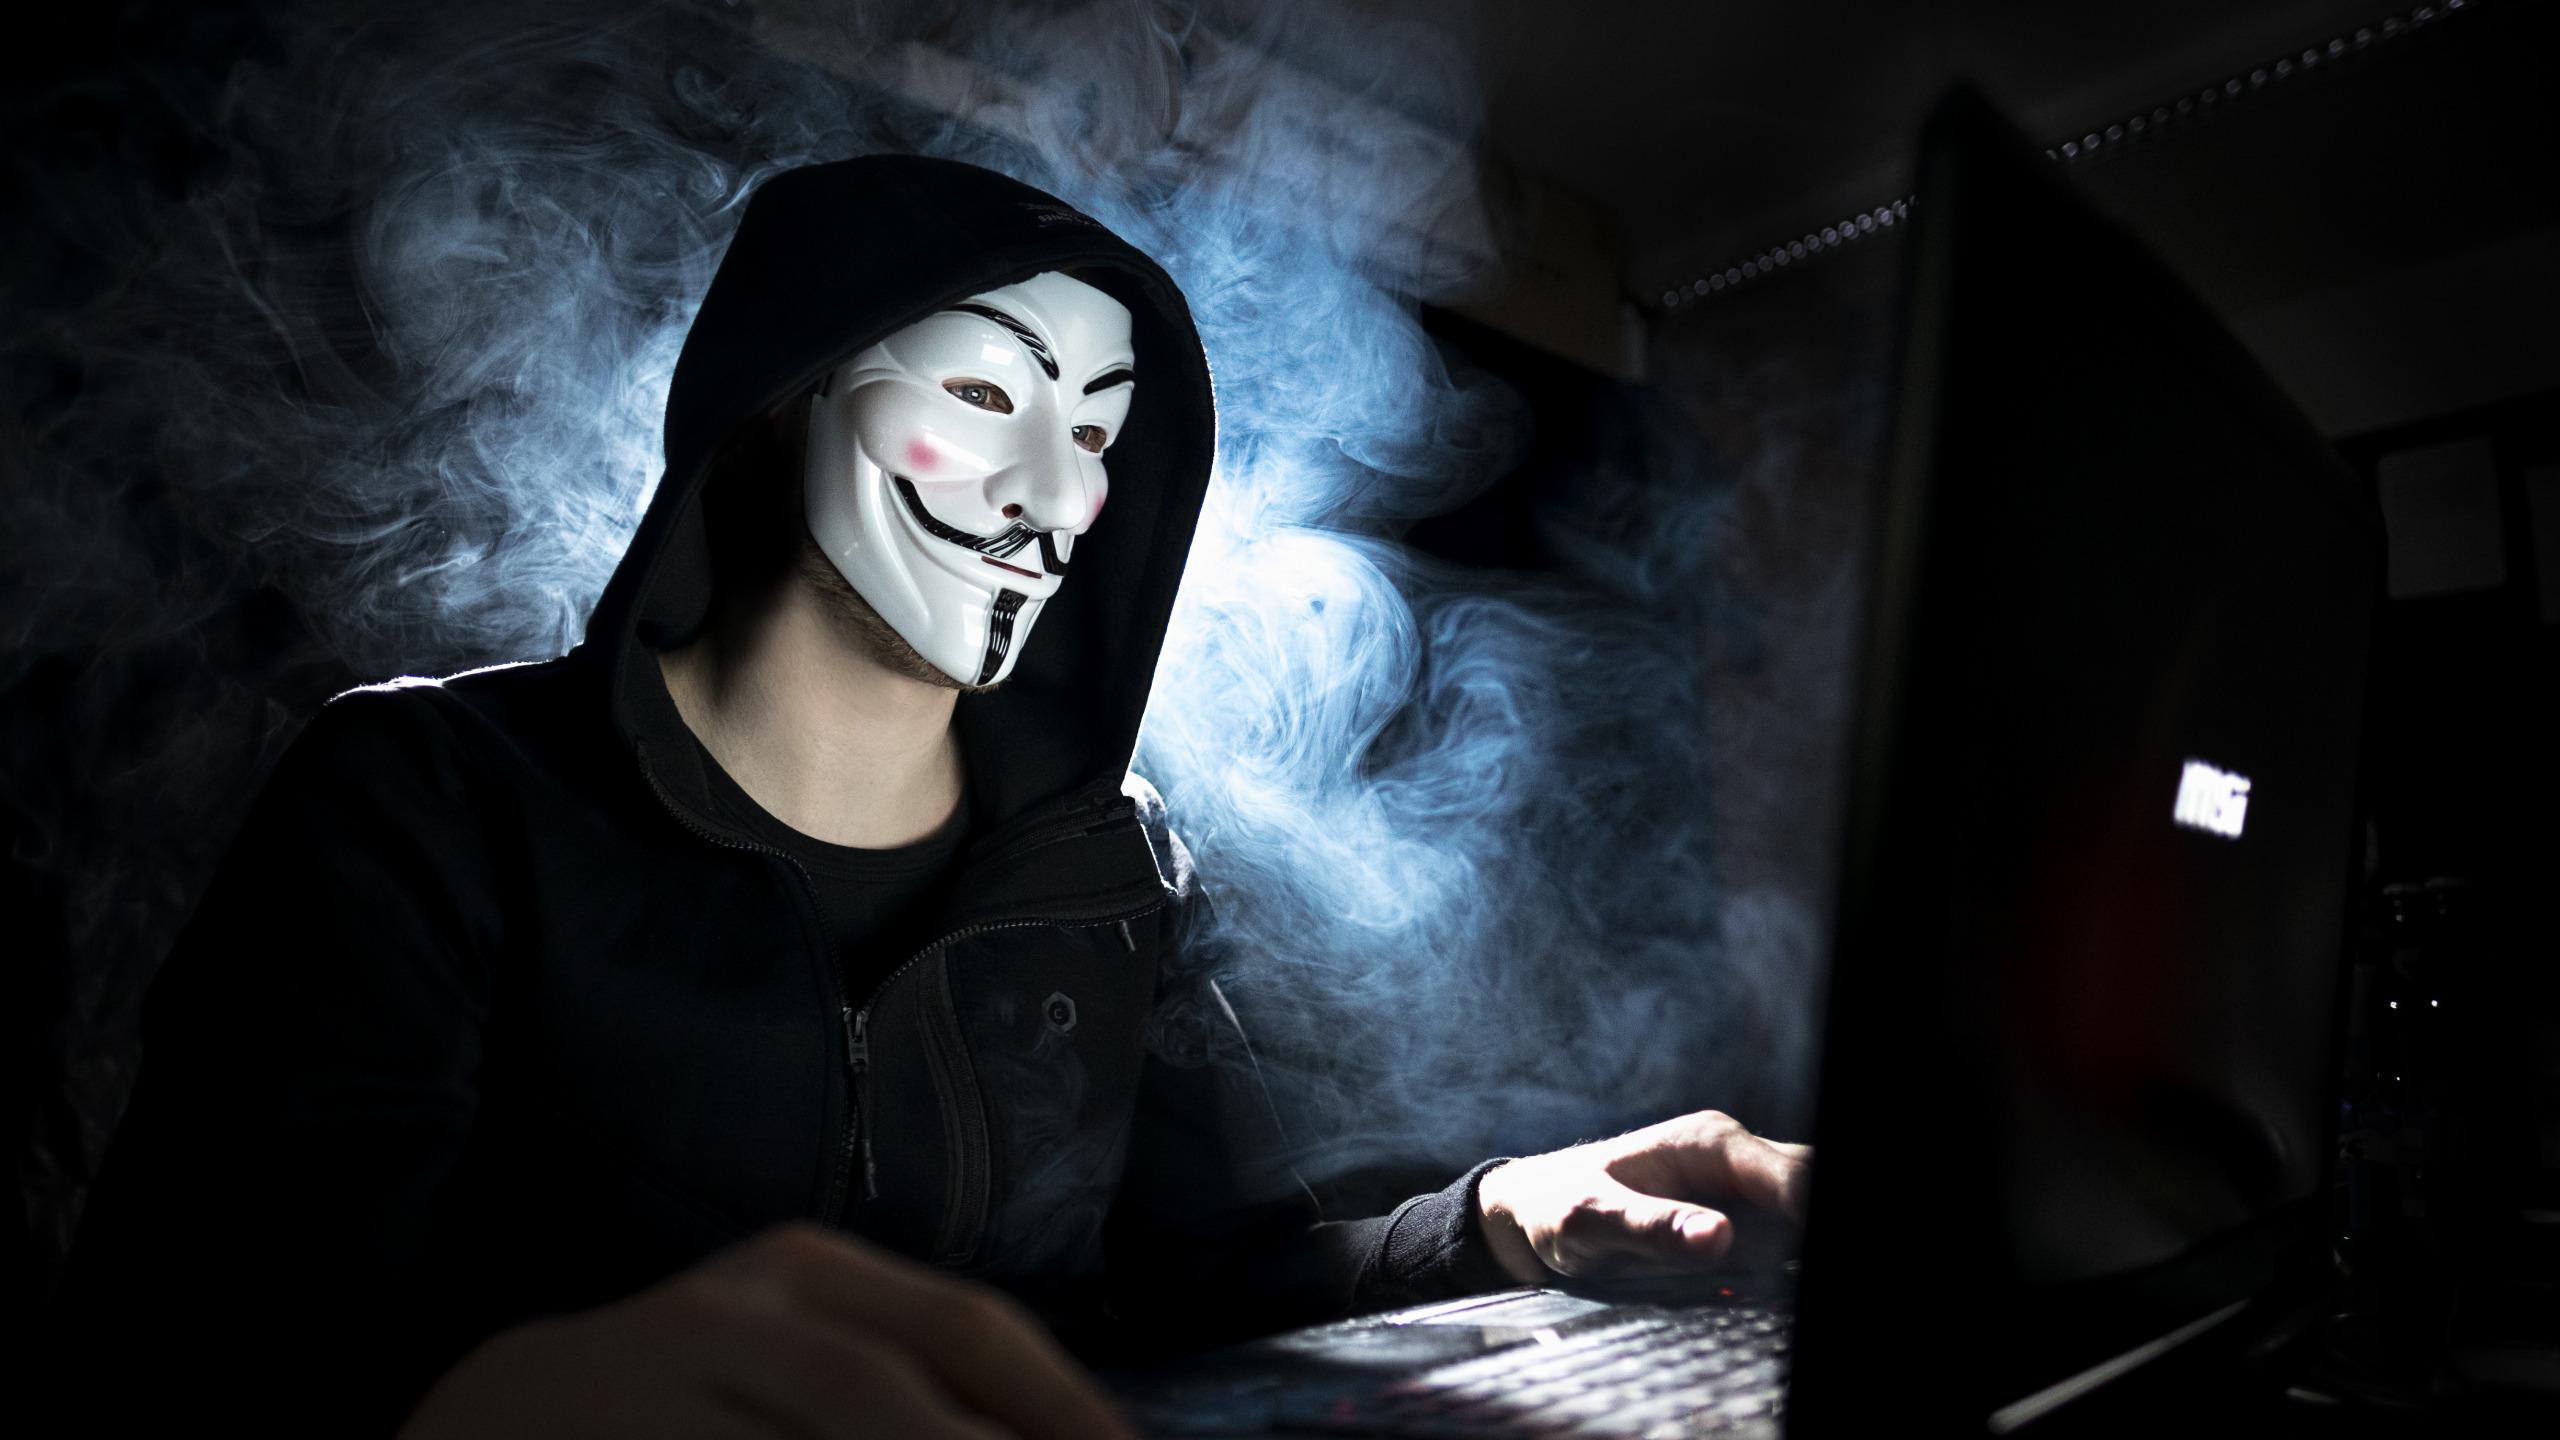 Anonymous darknet hyrda нет звука в браузере тор hydra